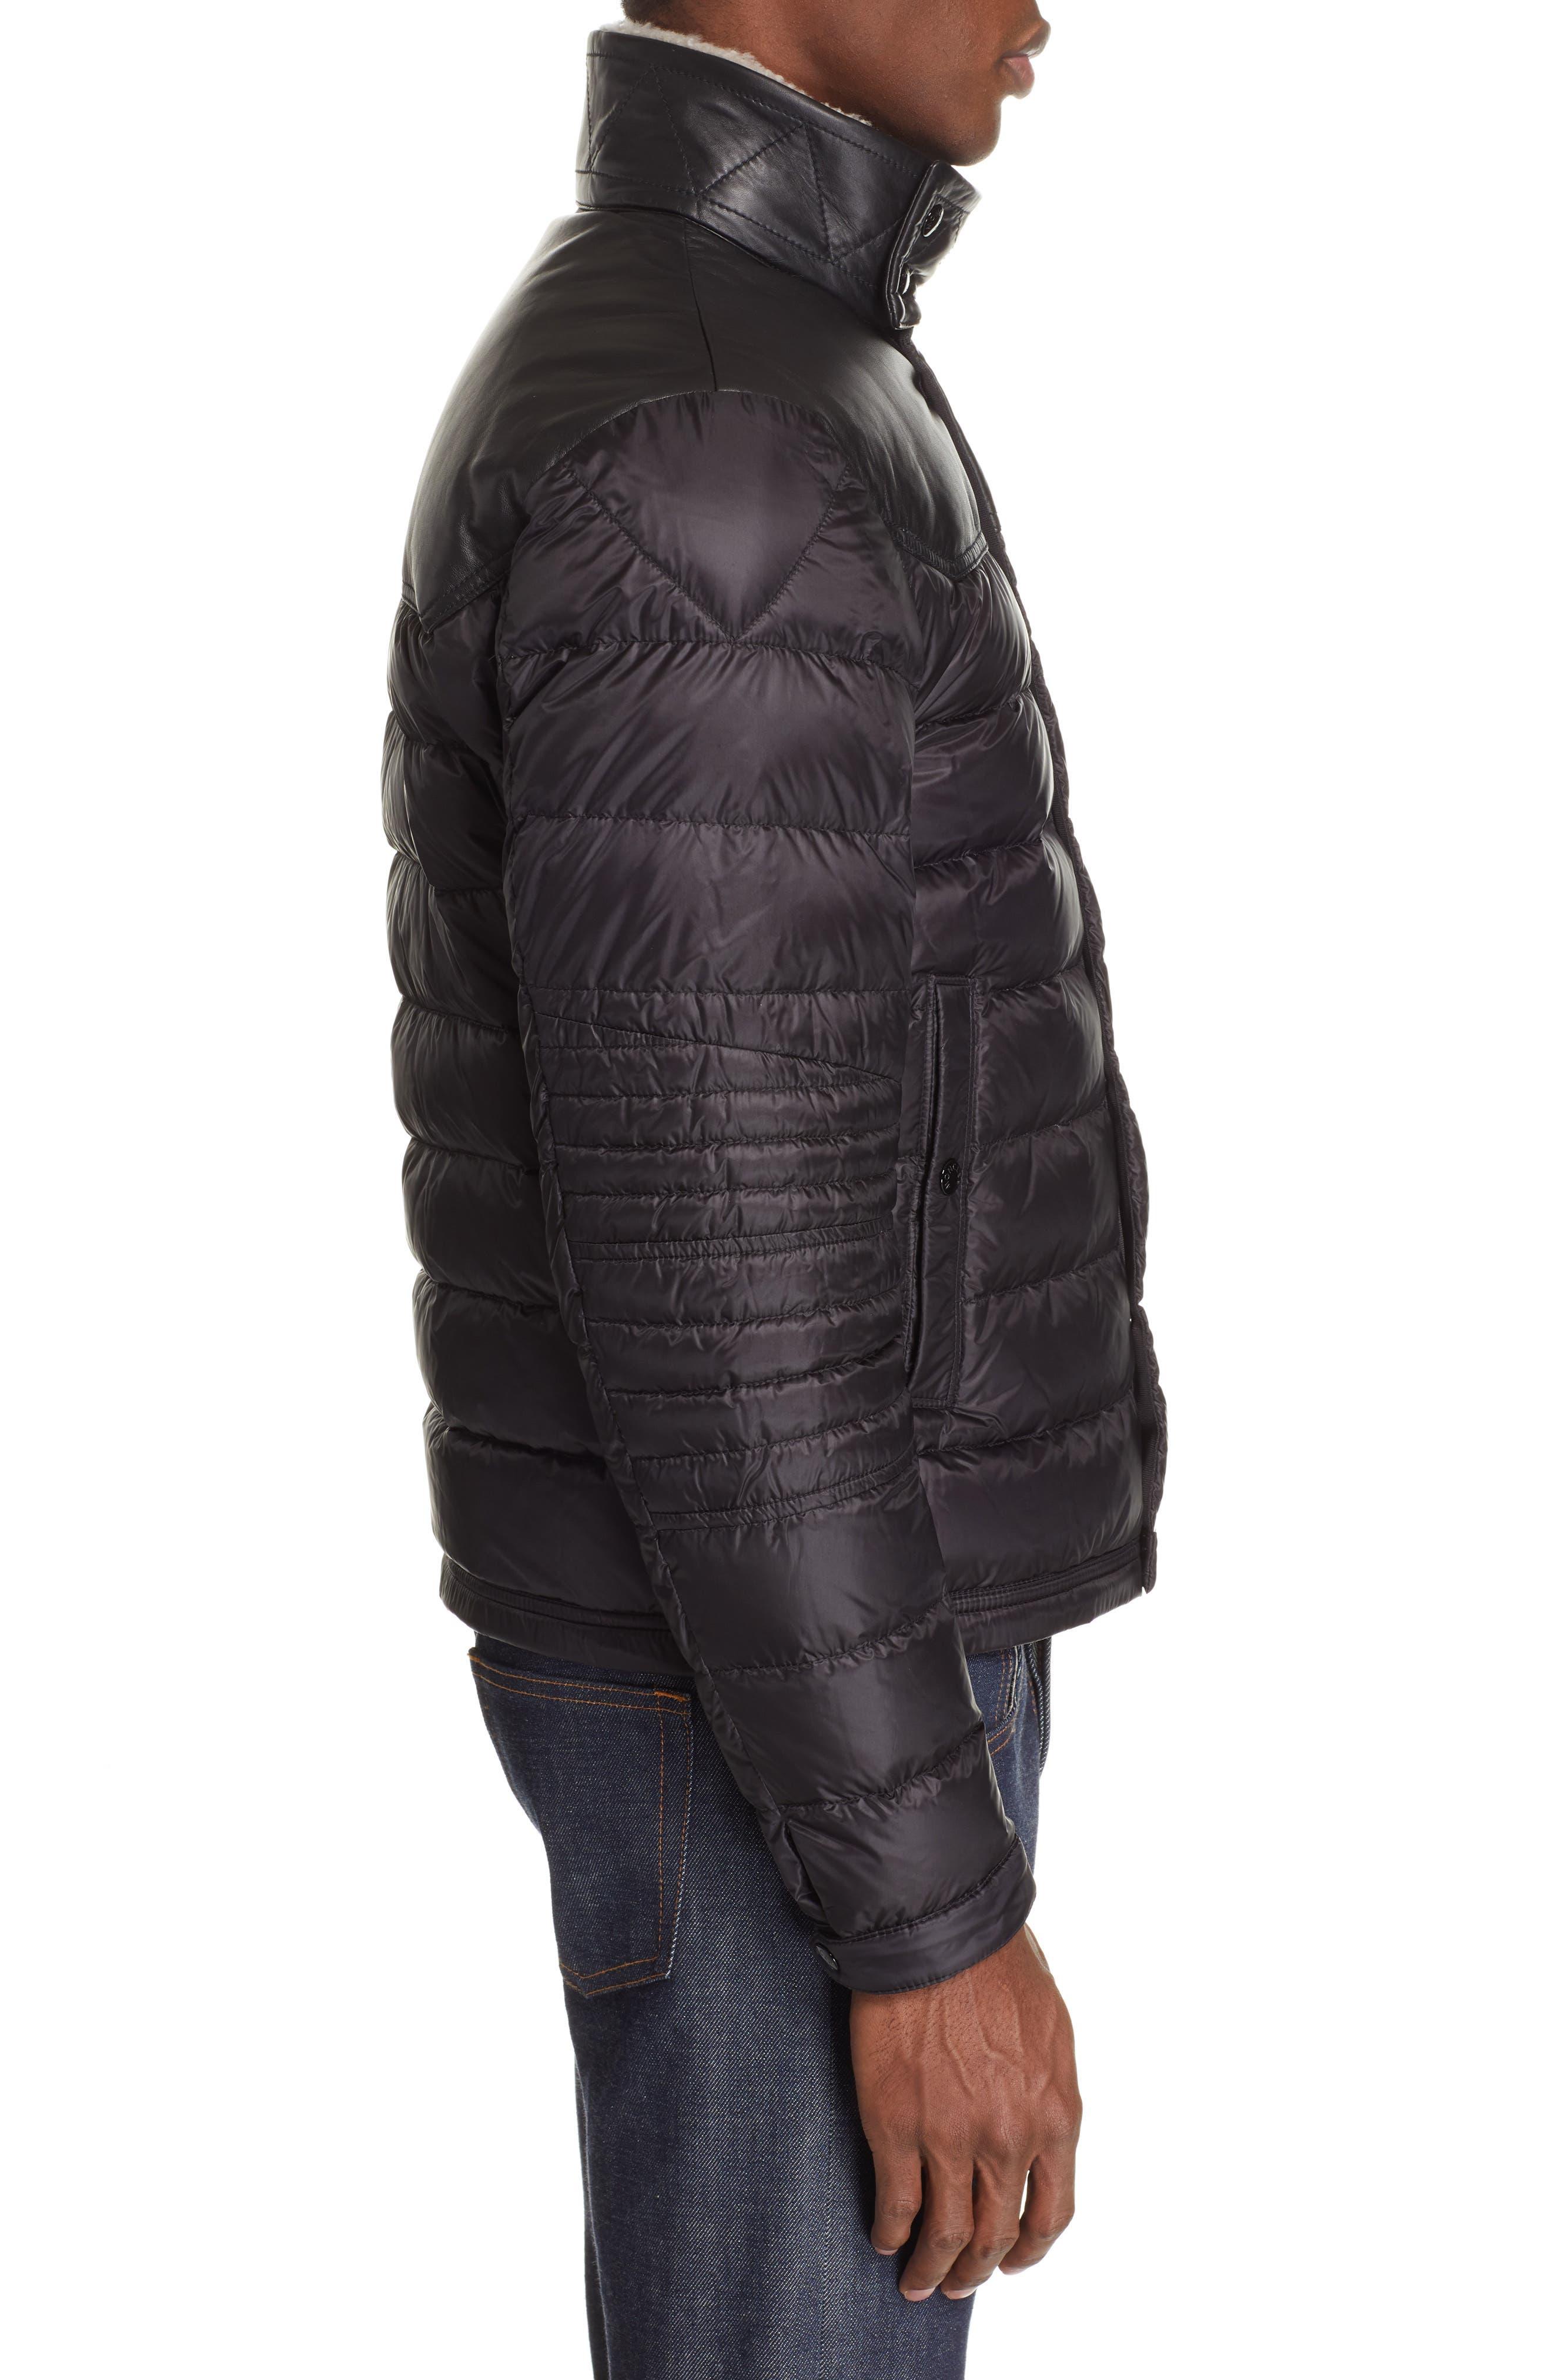 MONCLER, Vasserot Genuine Shearling Collar Jacket, Alternate thumbnail 4, color, BLACK